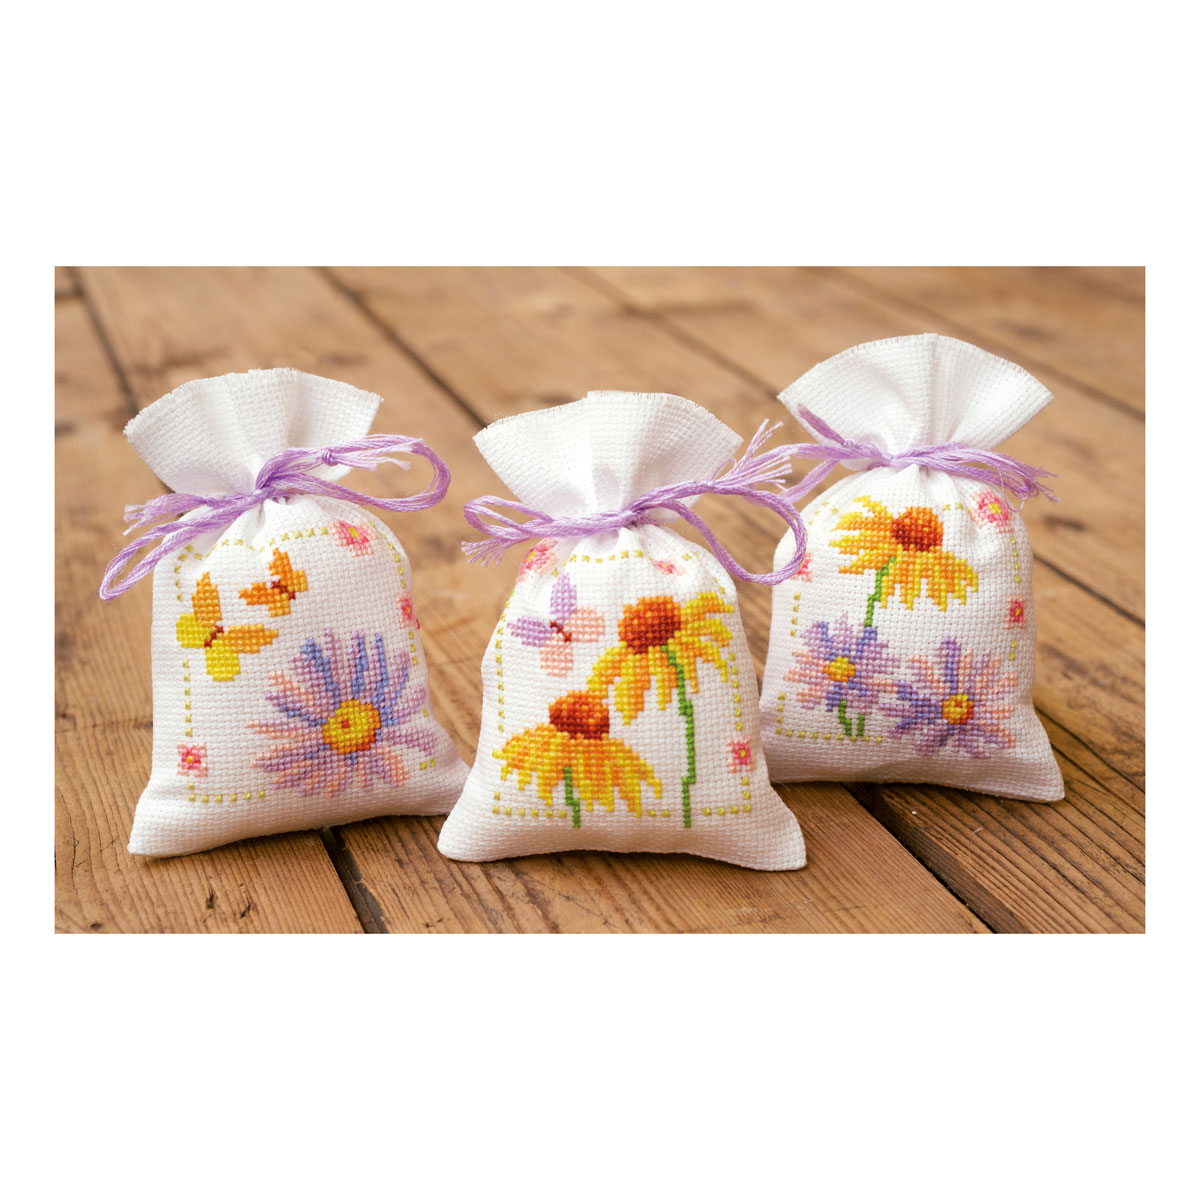 1x Counted Cross Thread Stitch Kit Pot-Pourri Bag Cornflowers /& B.flies Set of 3